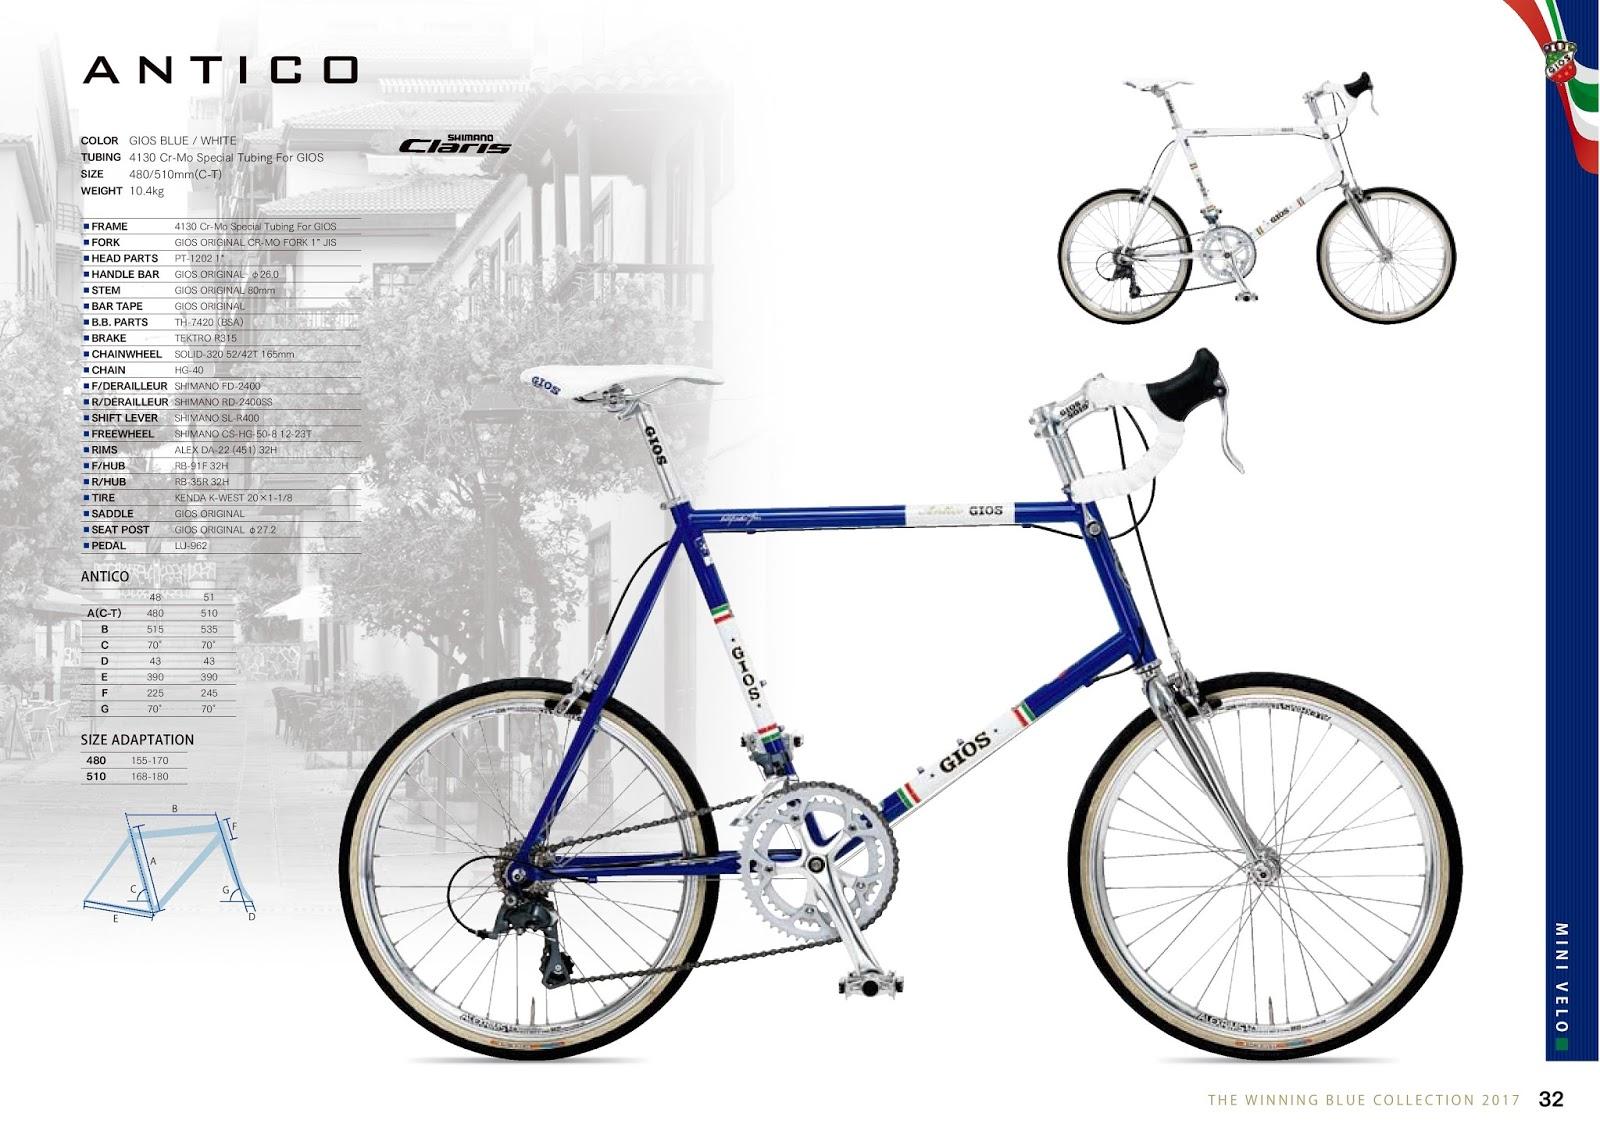 Folding Style Mini Velo Small Wheel Bicycles Part 2